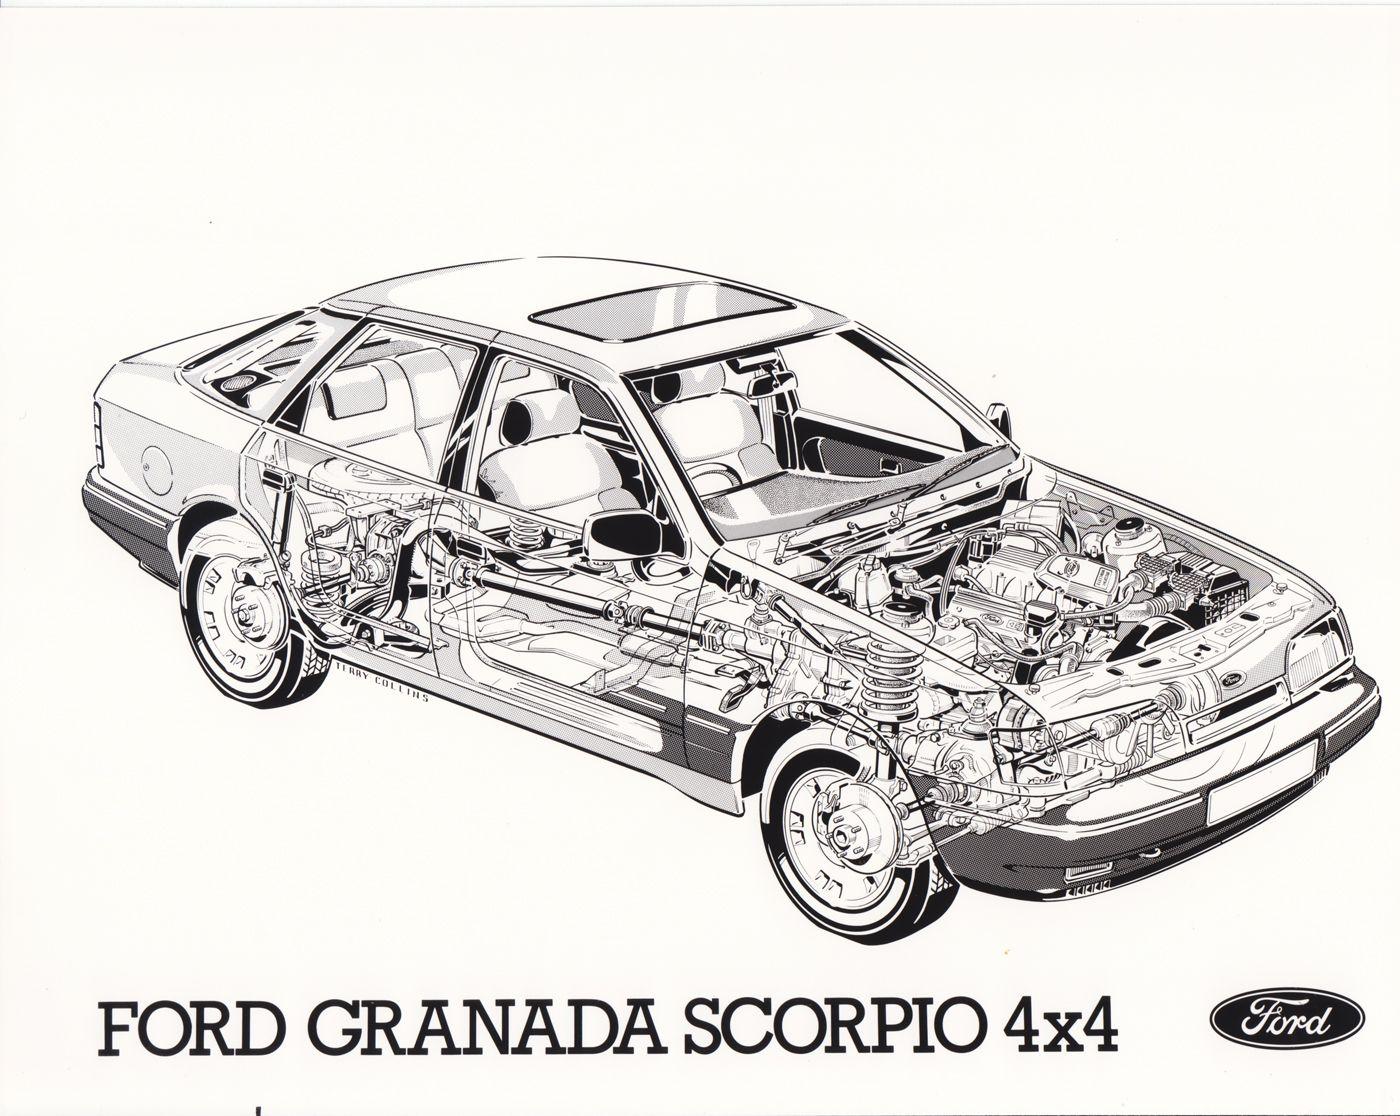 Ford Granada Scorpio 4x4 Uk